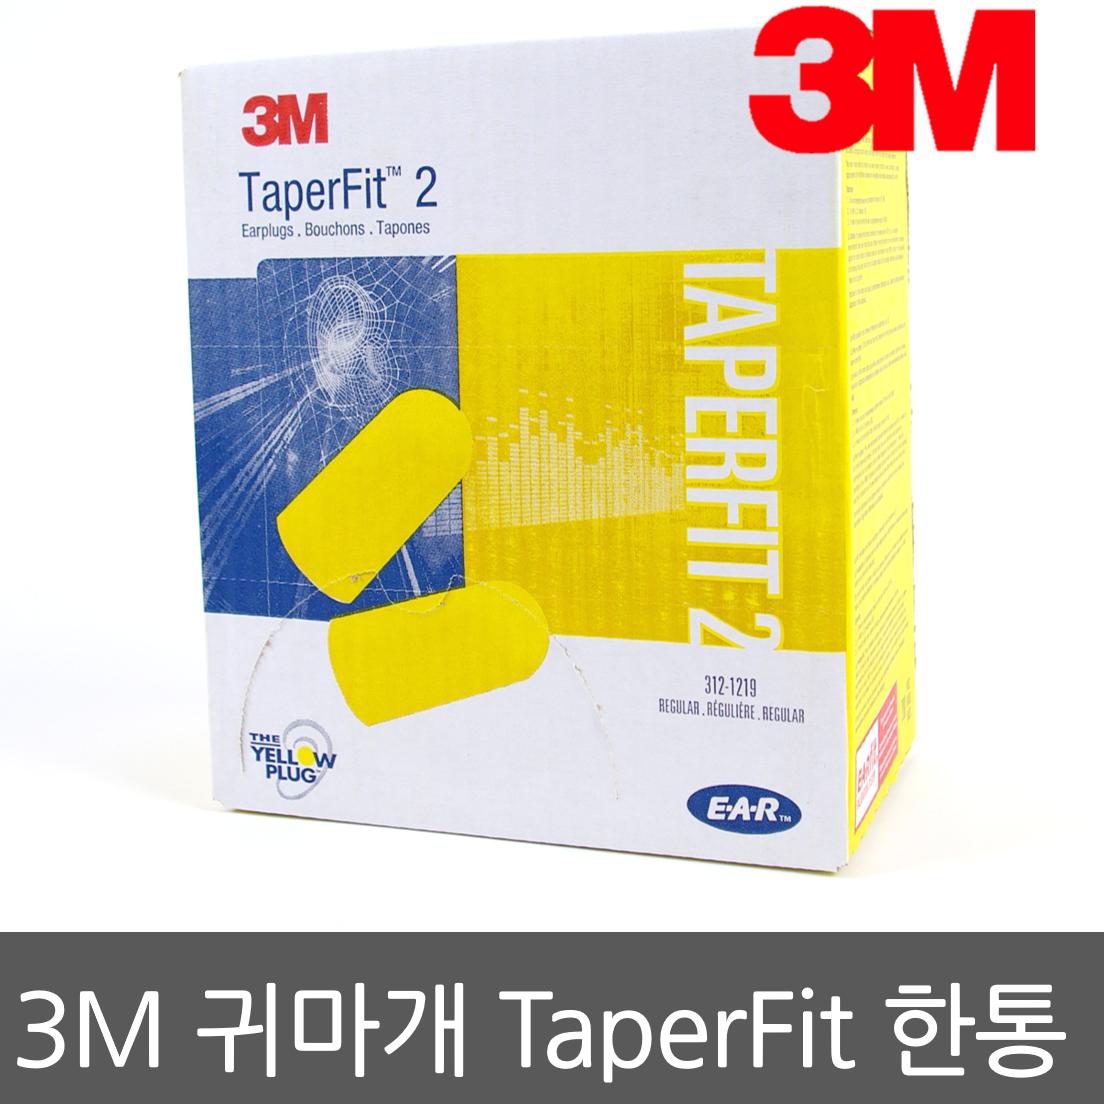 3M 귀마개 TaperFit 200조 한통 PU재질 소음차단 32dB, 1개